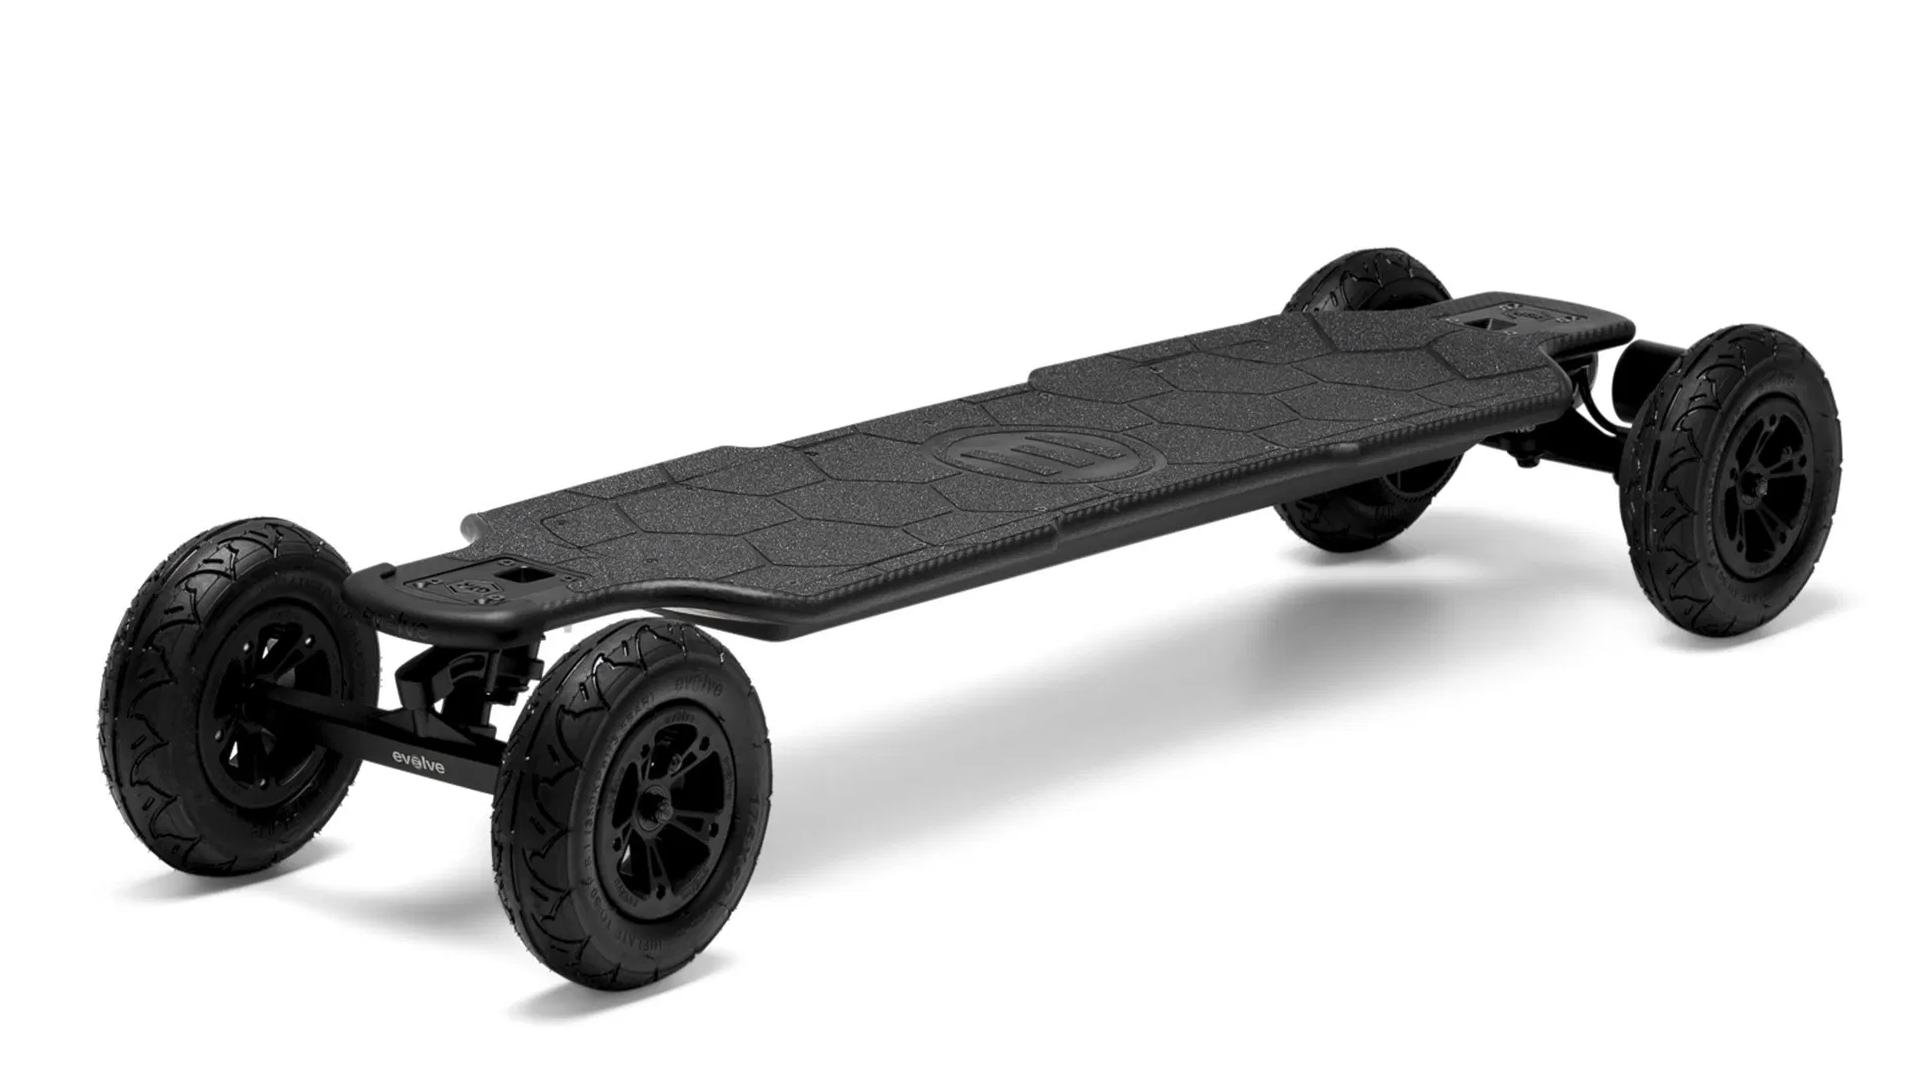 A photo of the carbon fiber Evolve GTR Longboard